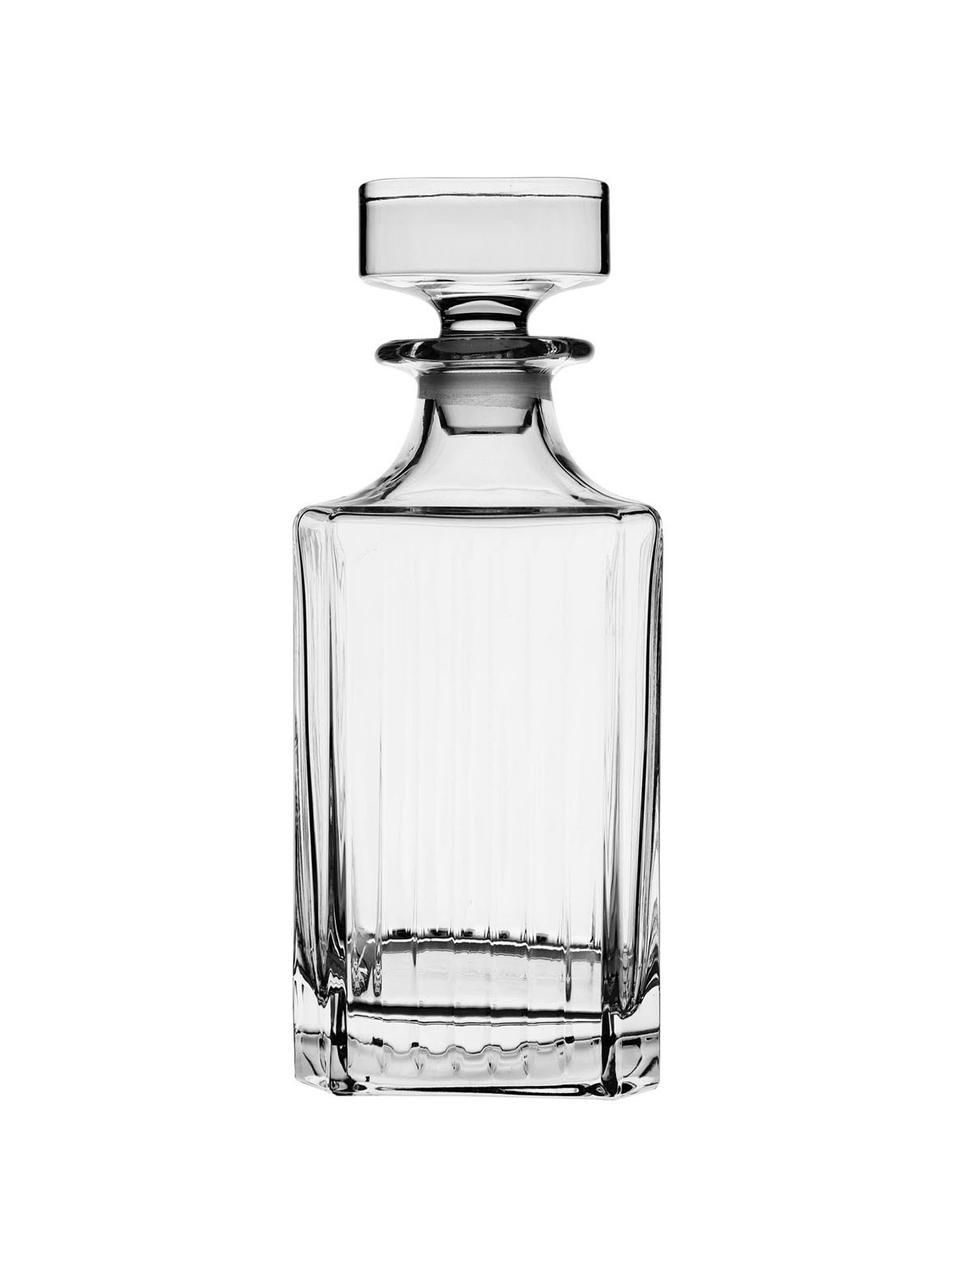 Carafe à décanter cristal avec bouchonTimeless, 750ml, Transparent